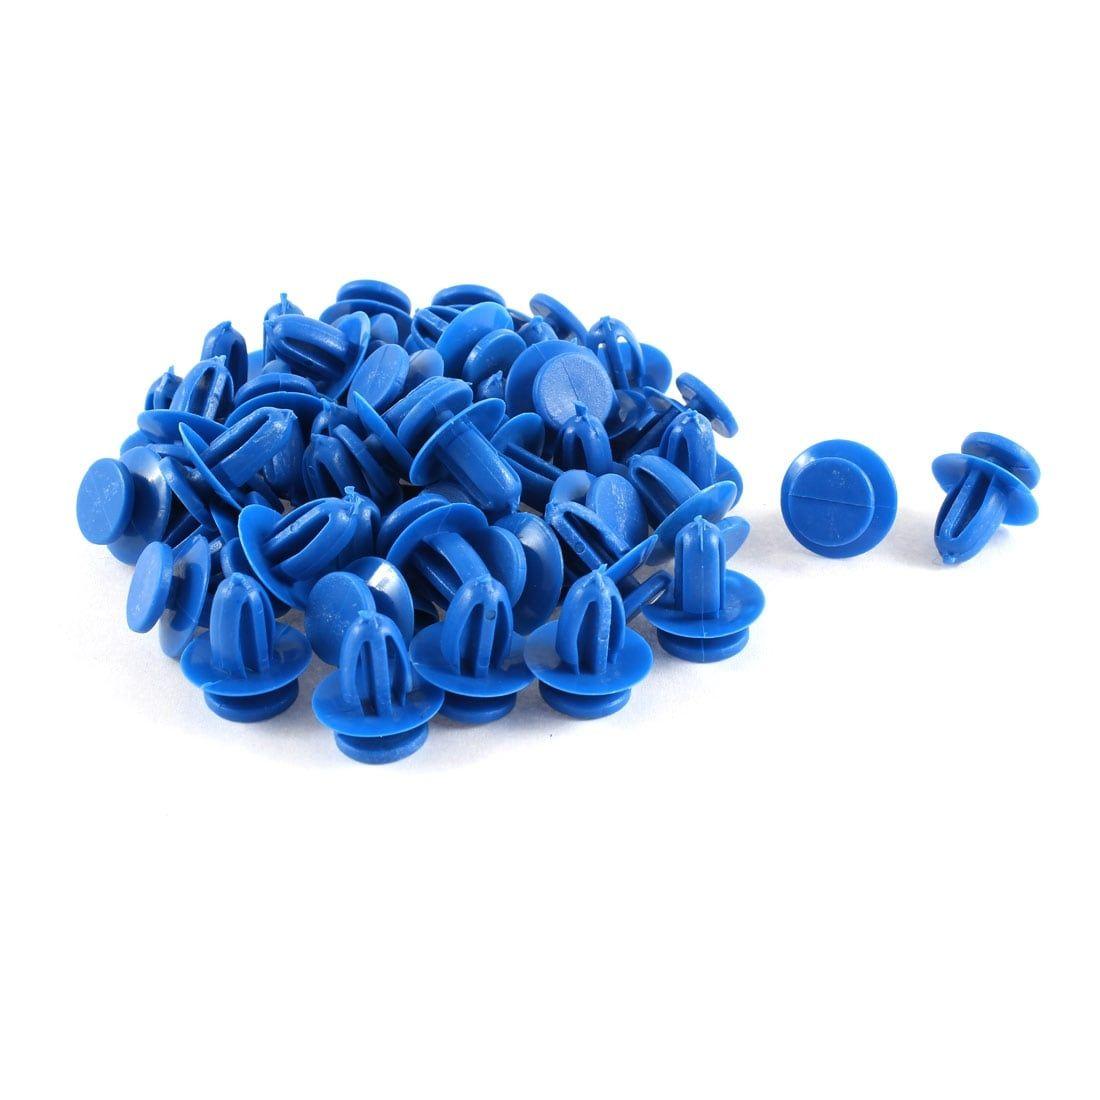 Unique Bargains 50 Pcs Blue Plastic Push in Fasteners Rivets Fender Clips 9mm Hole for Toyota